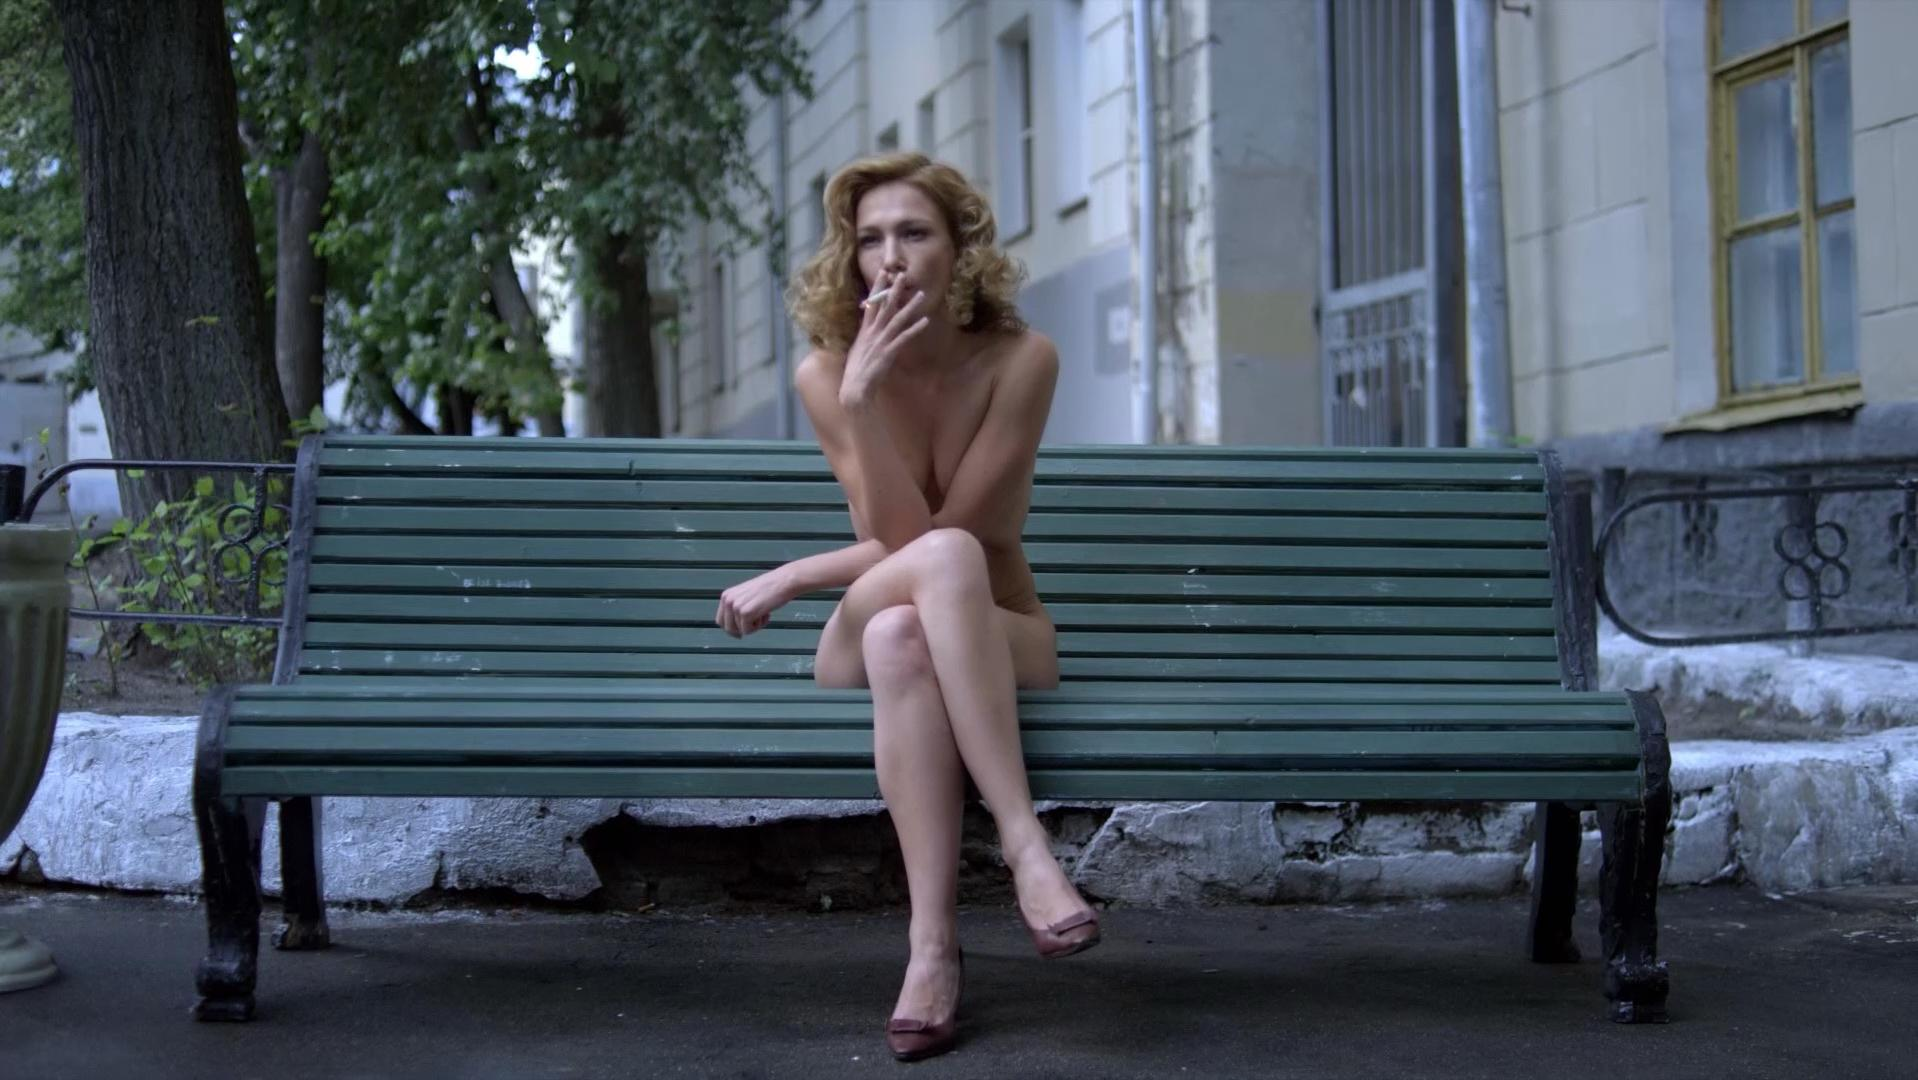 Evgeniya Brik nude - Ottepel s01e01 (2013)